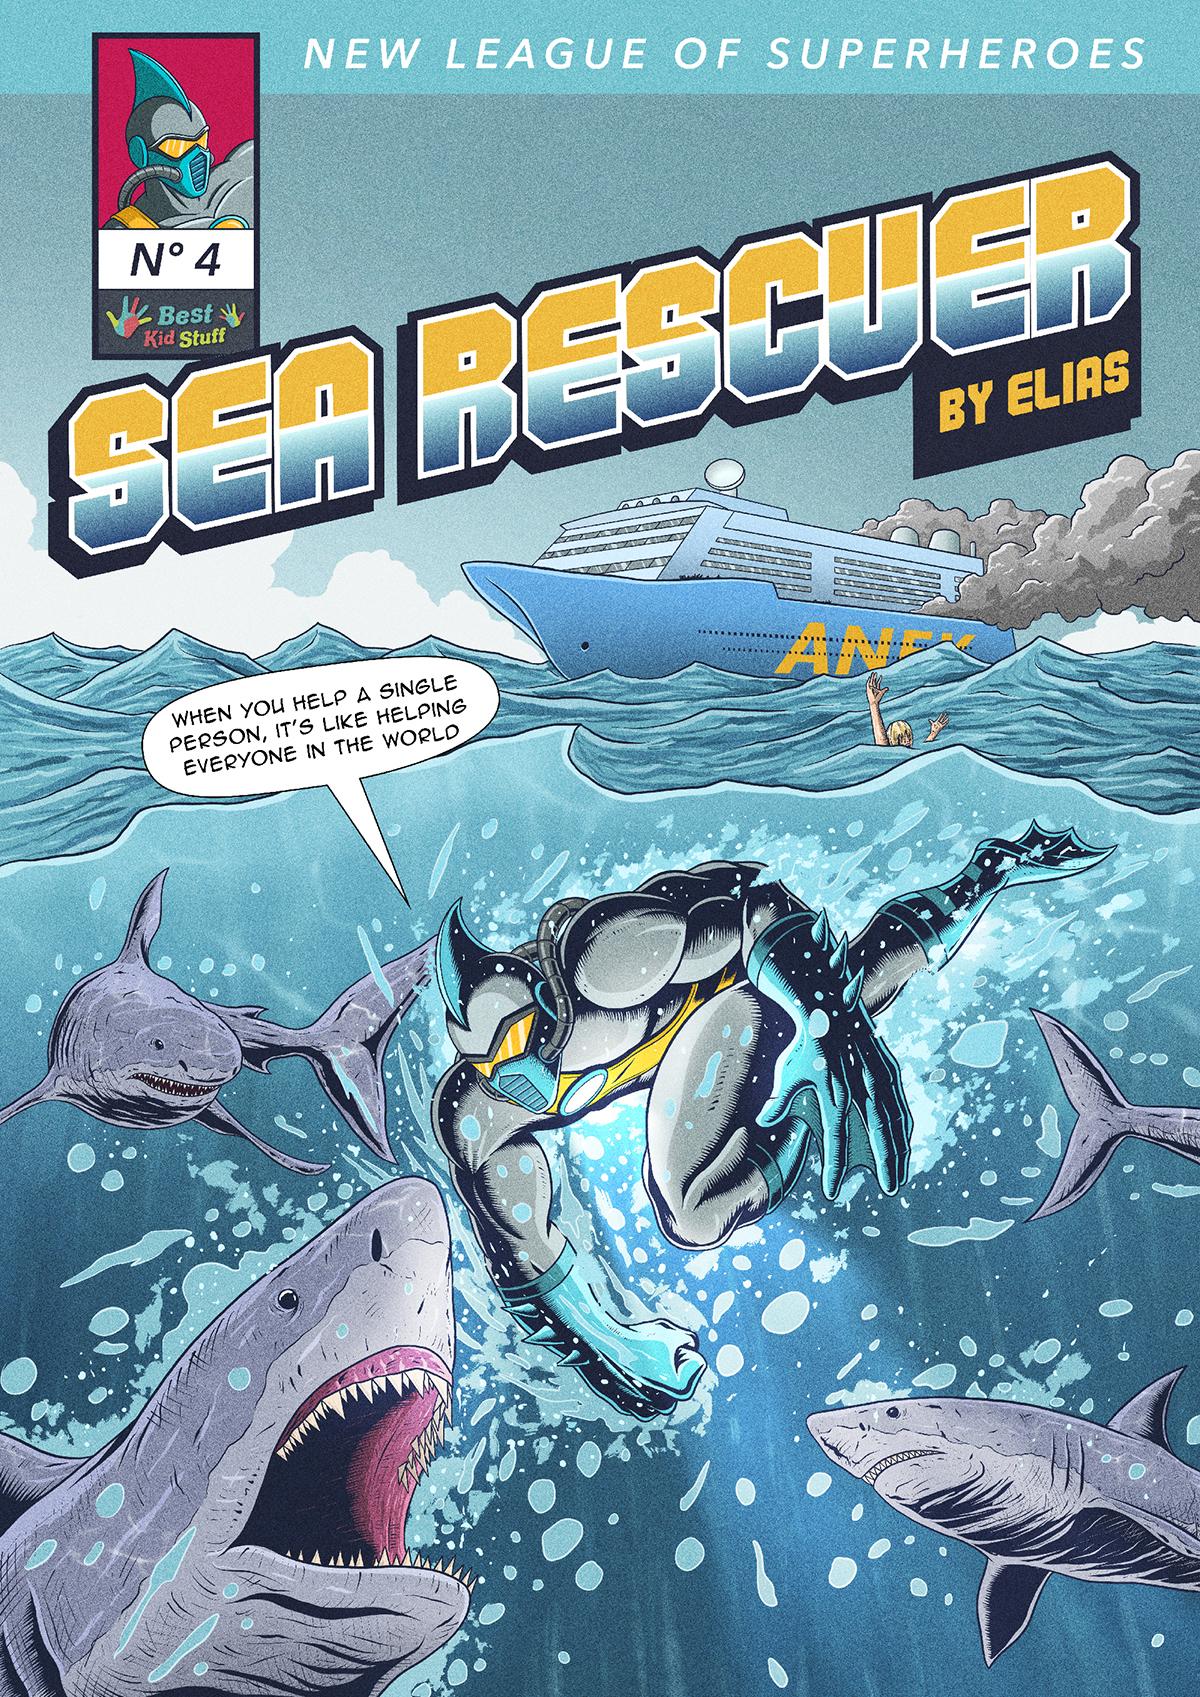 04 New League of Superheroes Sea Rescuer